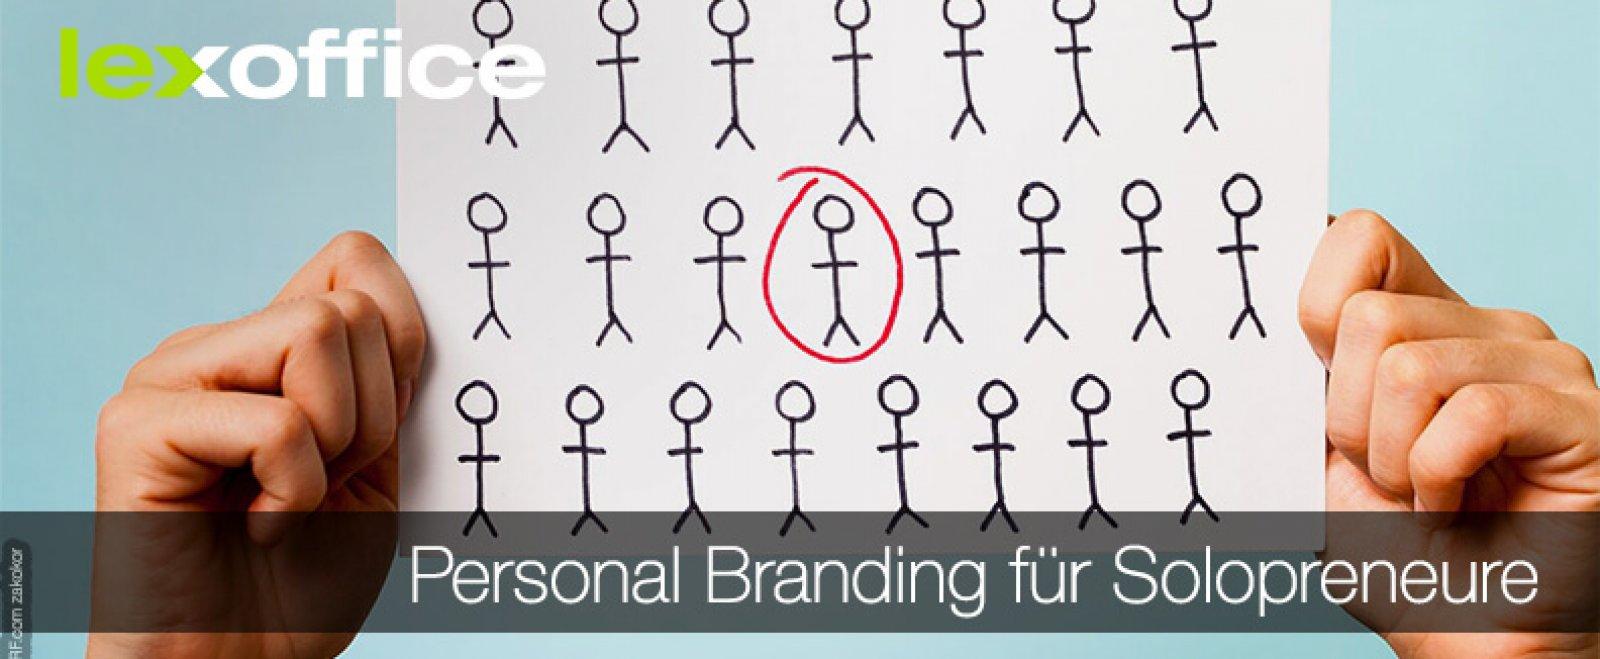 Markenaufbau: Personal Branding für Solopreneure